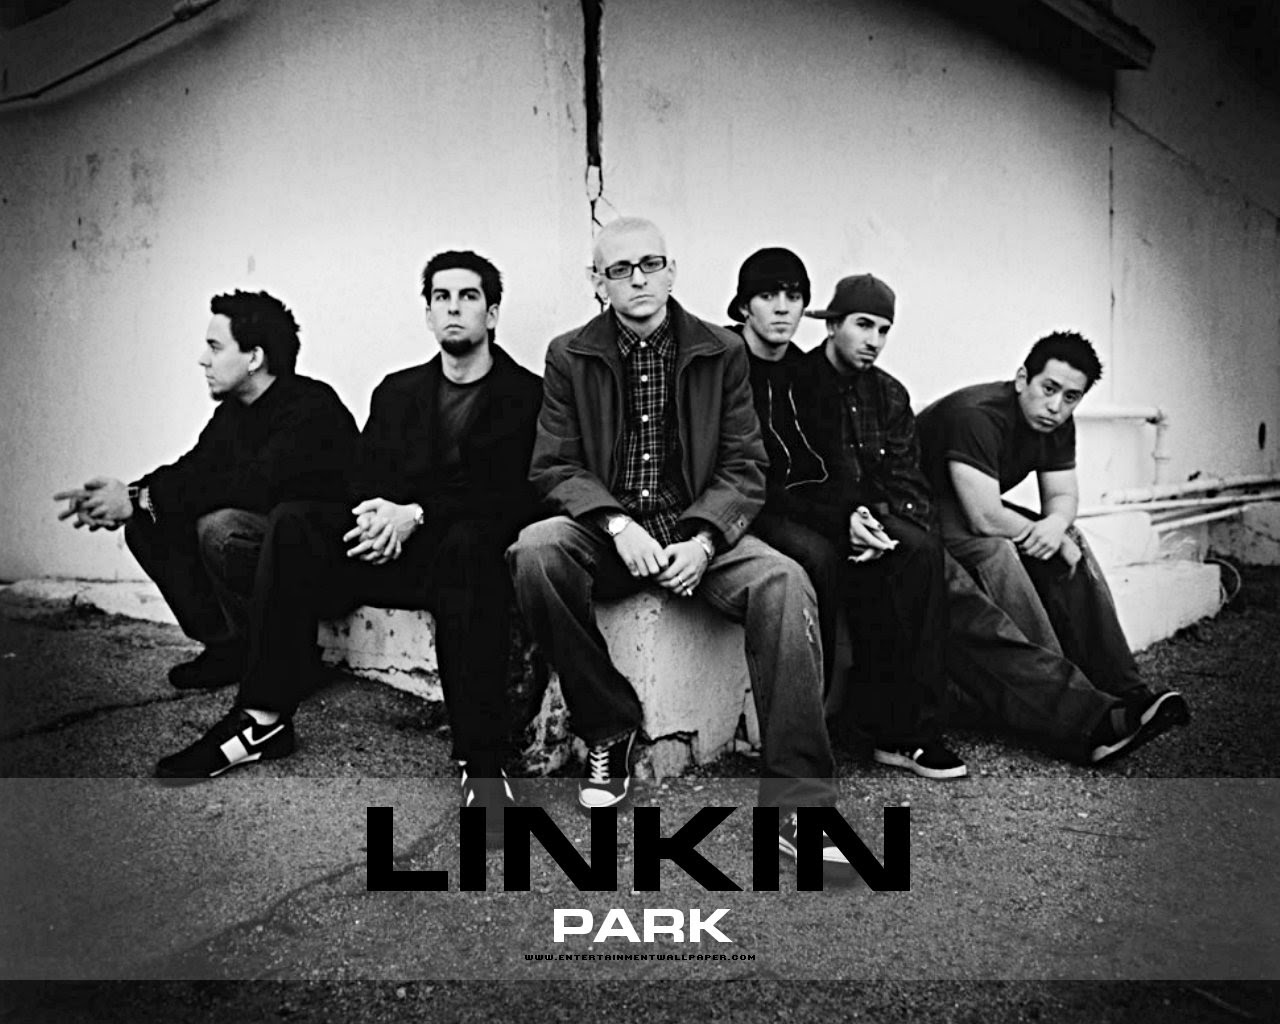 Linkin Park Wallpaper 1280x1024 43580